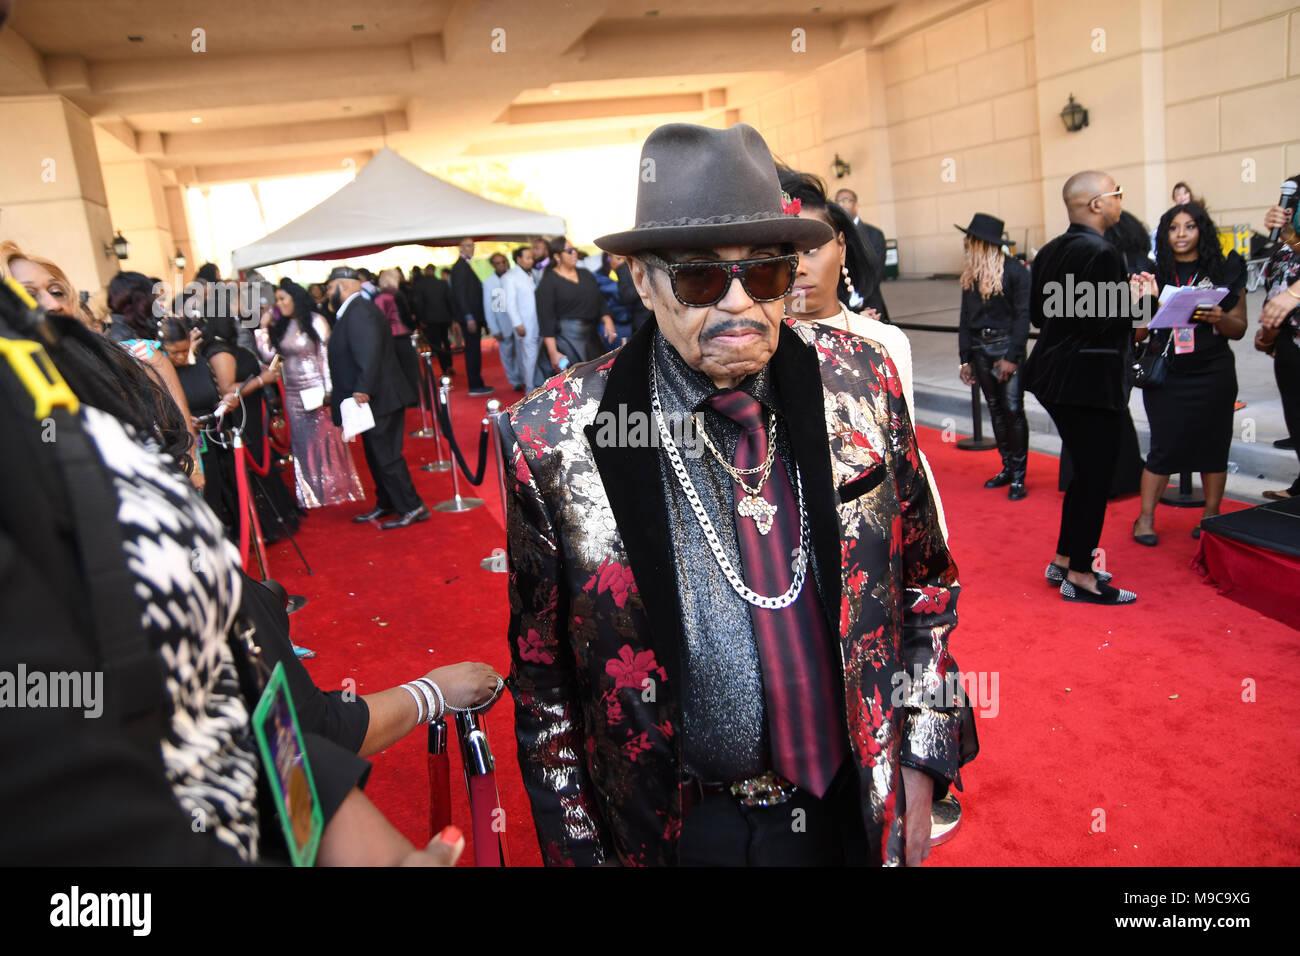 Las Vegas, NV, USA, 24 Mar 2018. Joe Jackson walking the red carpet at the 33 annual Stellar Awards in Las Vegas Nevada.  Photo Credit:  Marty Jean-Louis - Stock Image